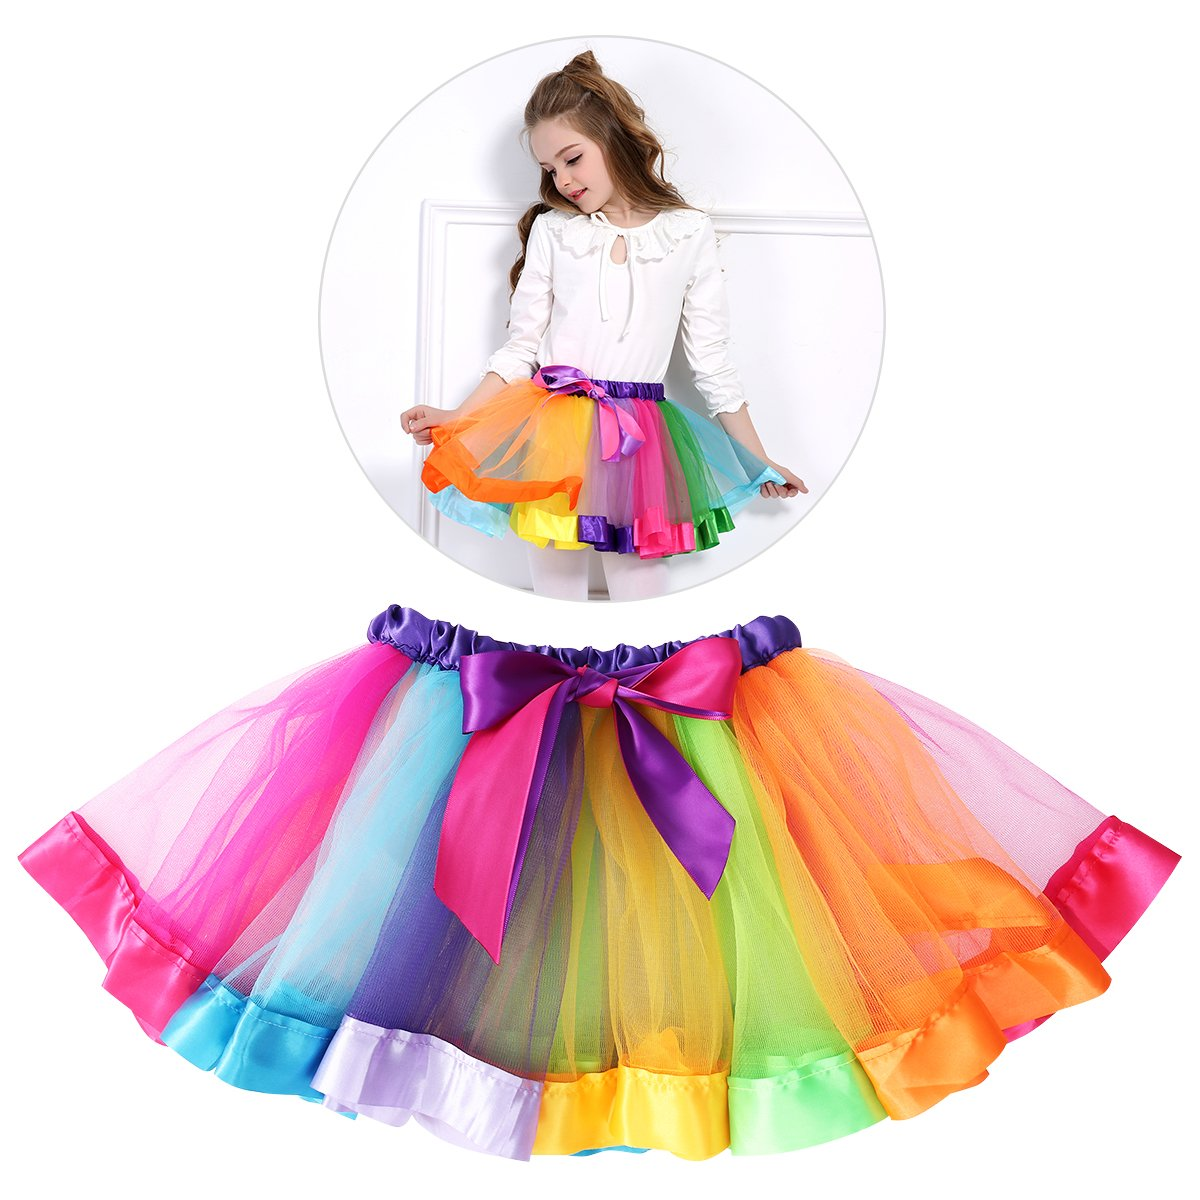 LUOEM Rainbow Tutu Skirts Costume Princess Dance Dress Ruffle Tiered Tutus Performance Dress Skirt Dress For Girls 4-8 Years Old Size L